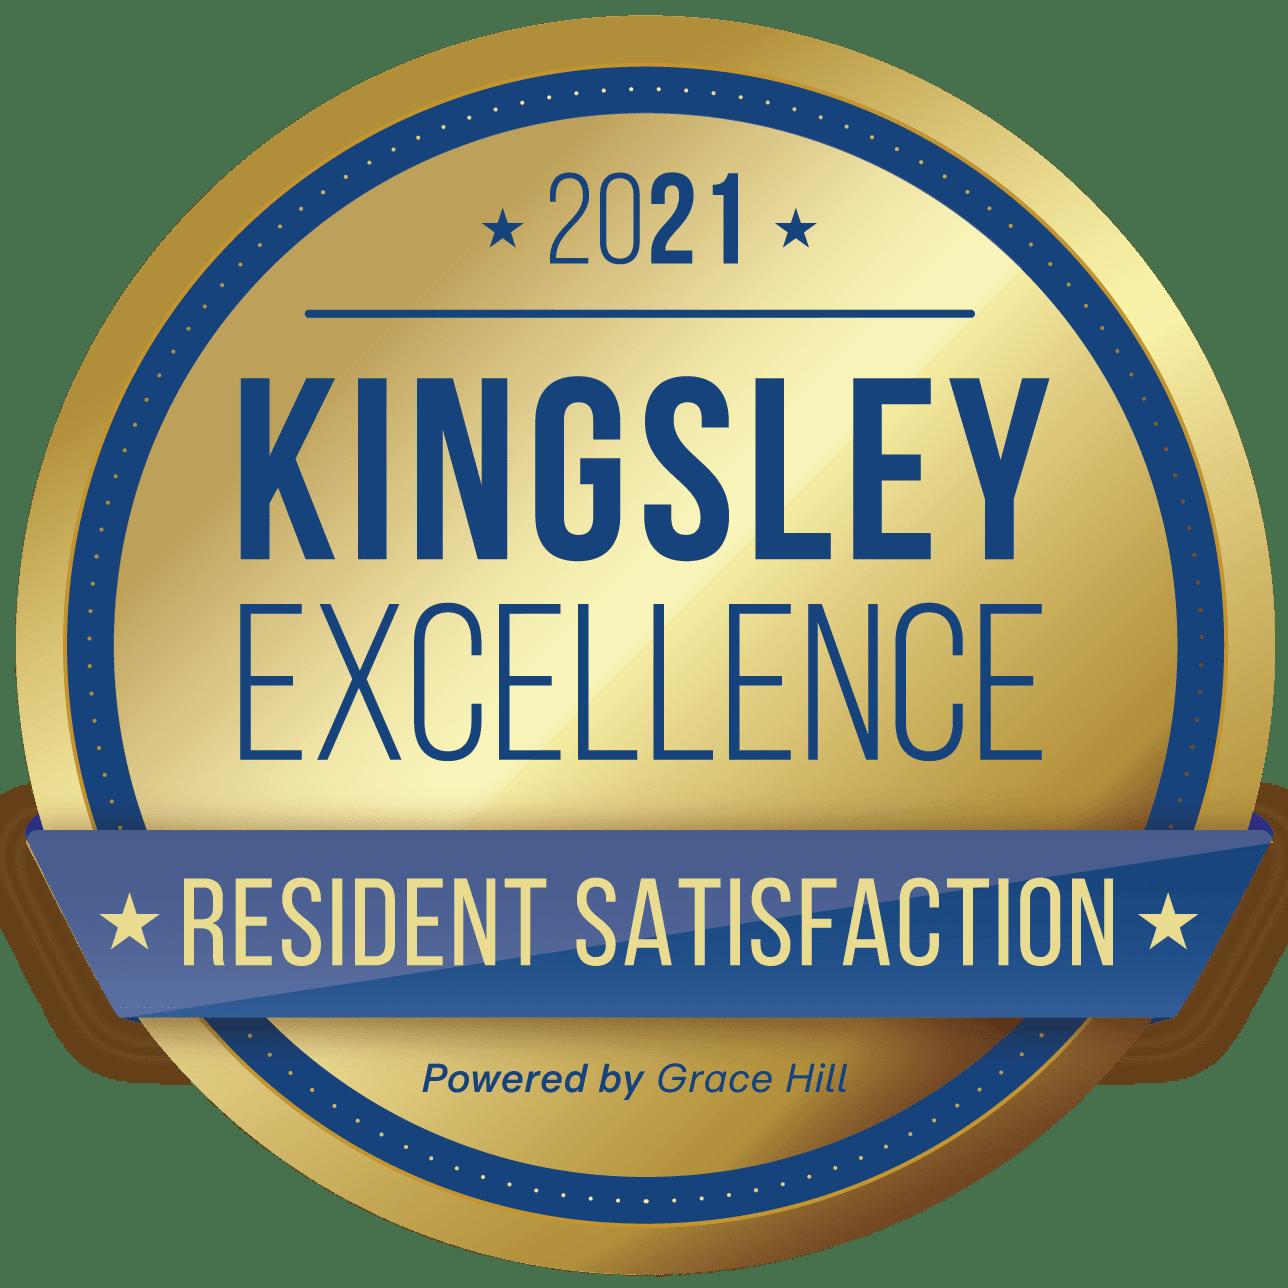 Kingsley Excellence Award